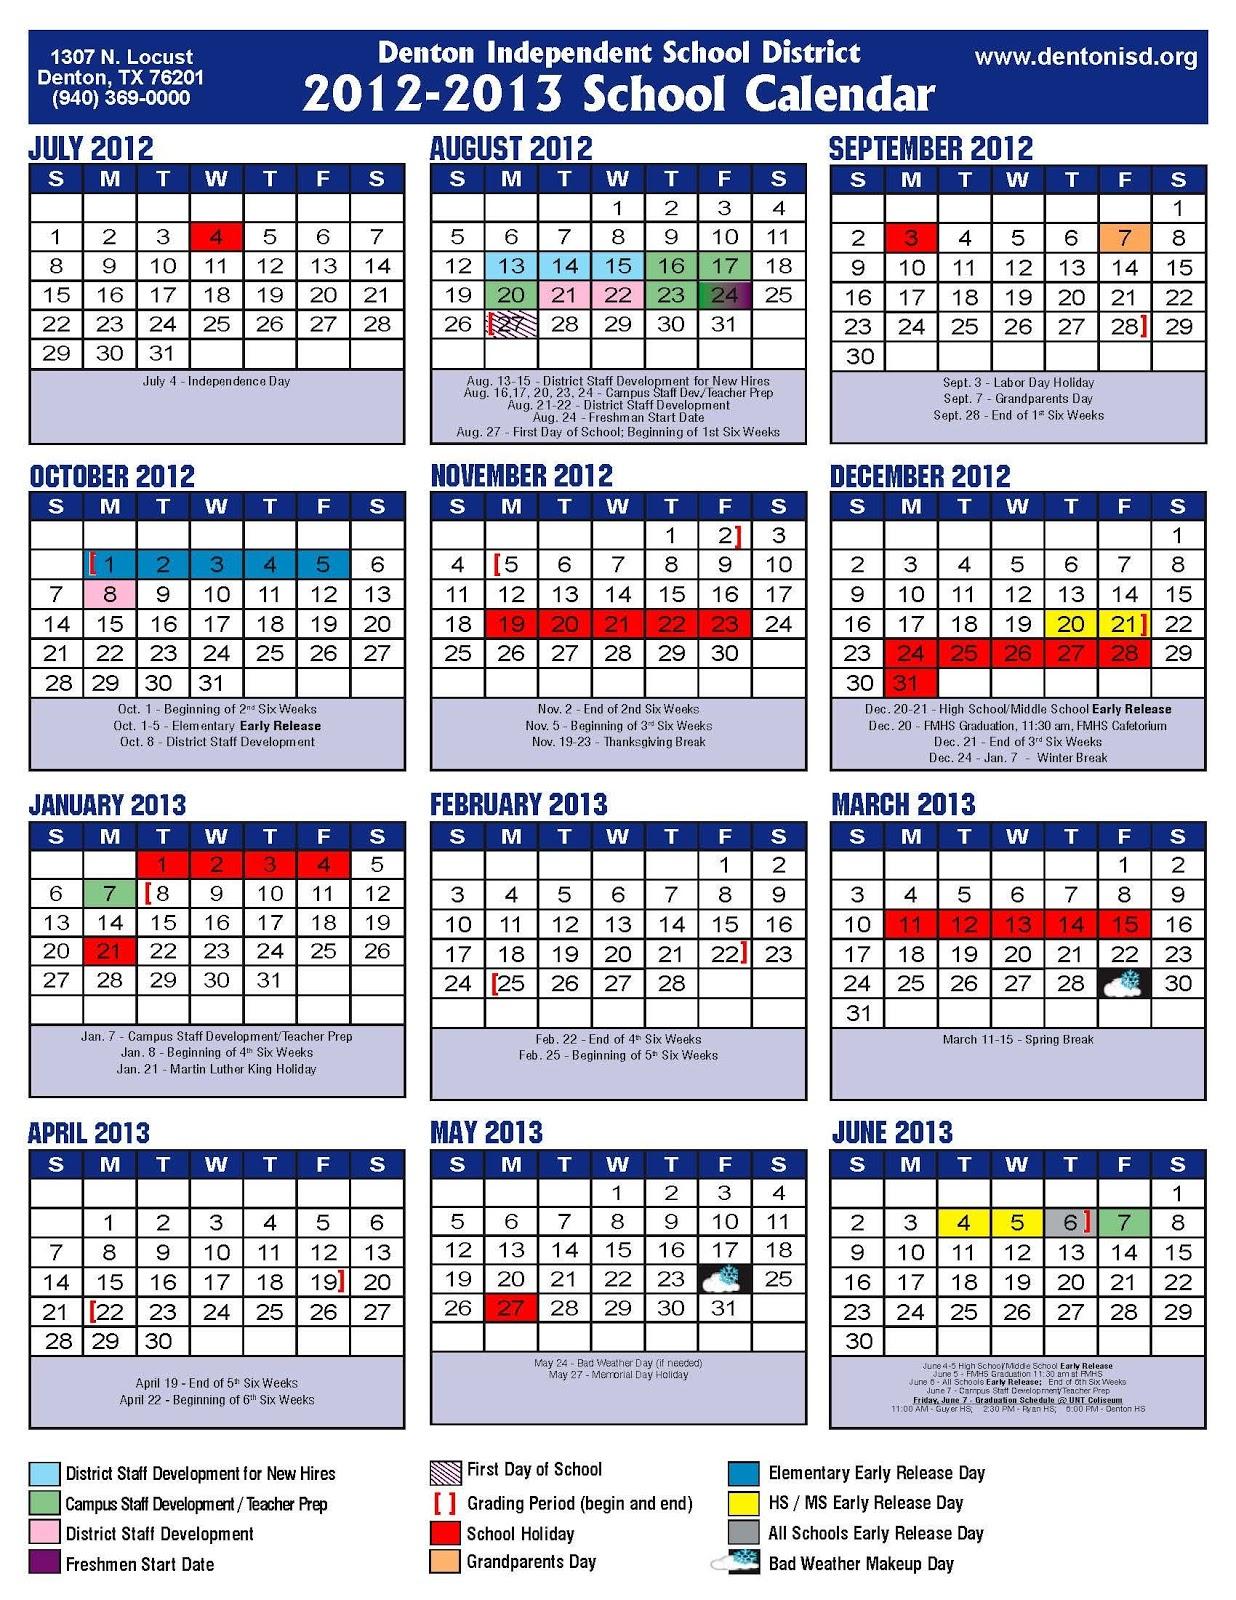 Denton Isd School Calendar Inside Brownsville Bisd School District Calendar